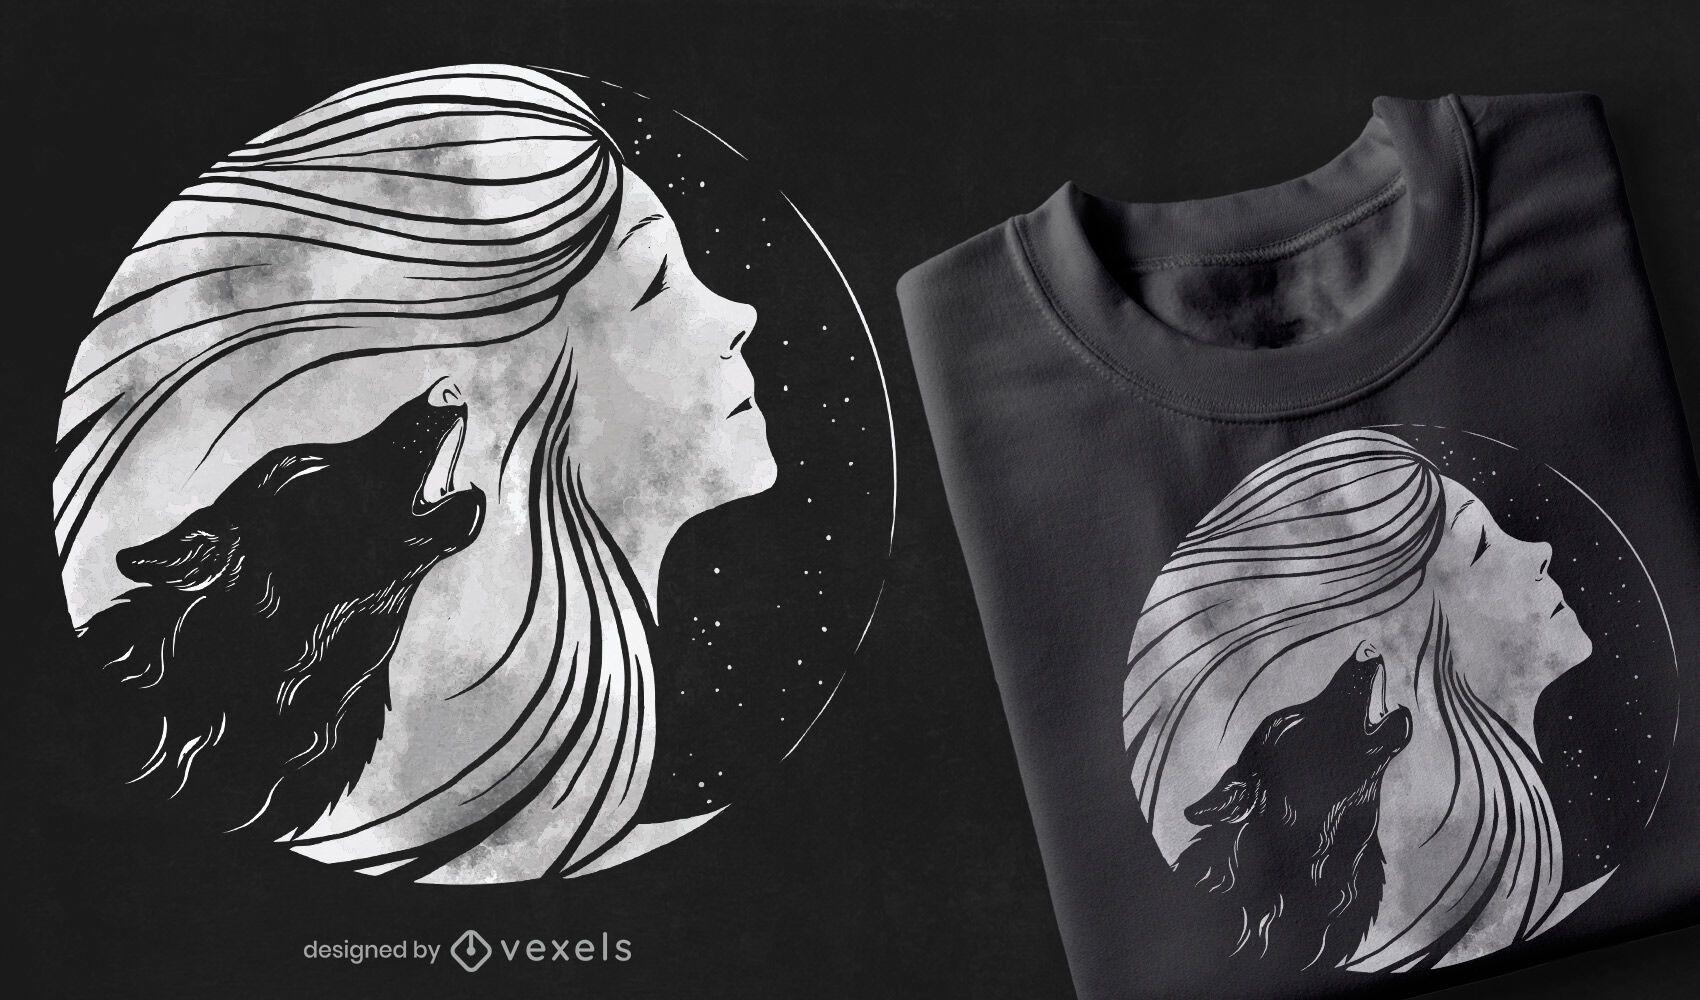 Moon woman t-shirt design